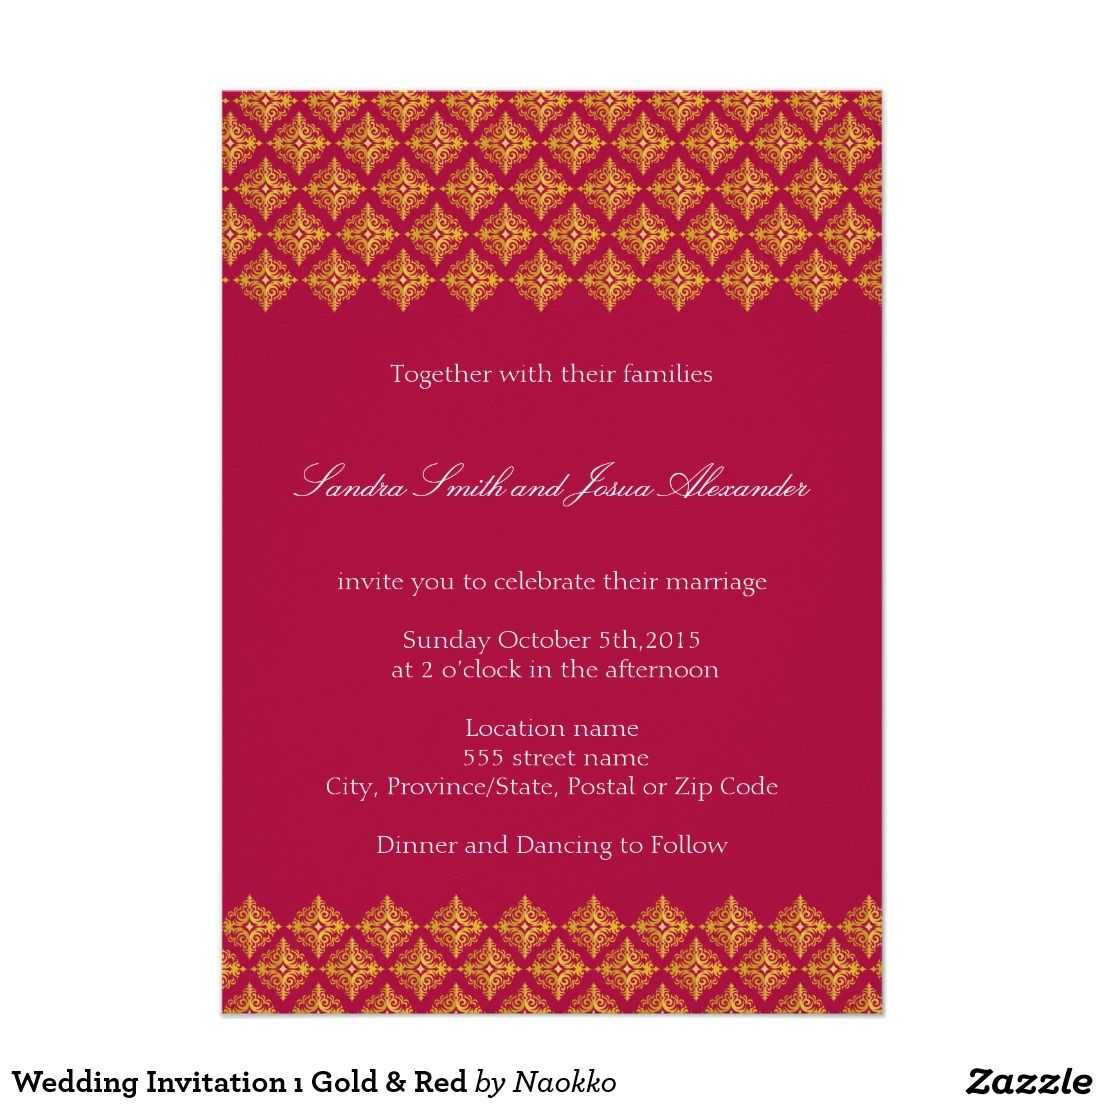 Wedding Invitation ı Gold & Red | Wedding stuff and Weddings